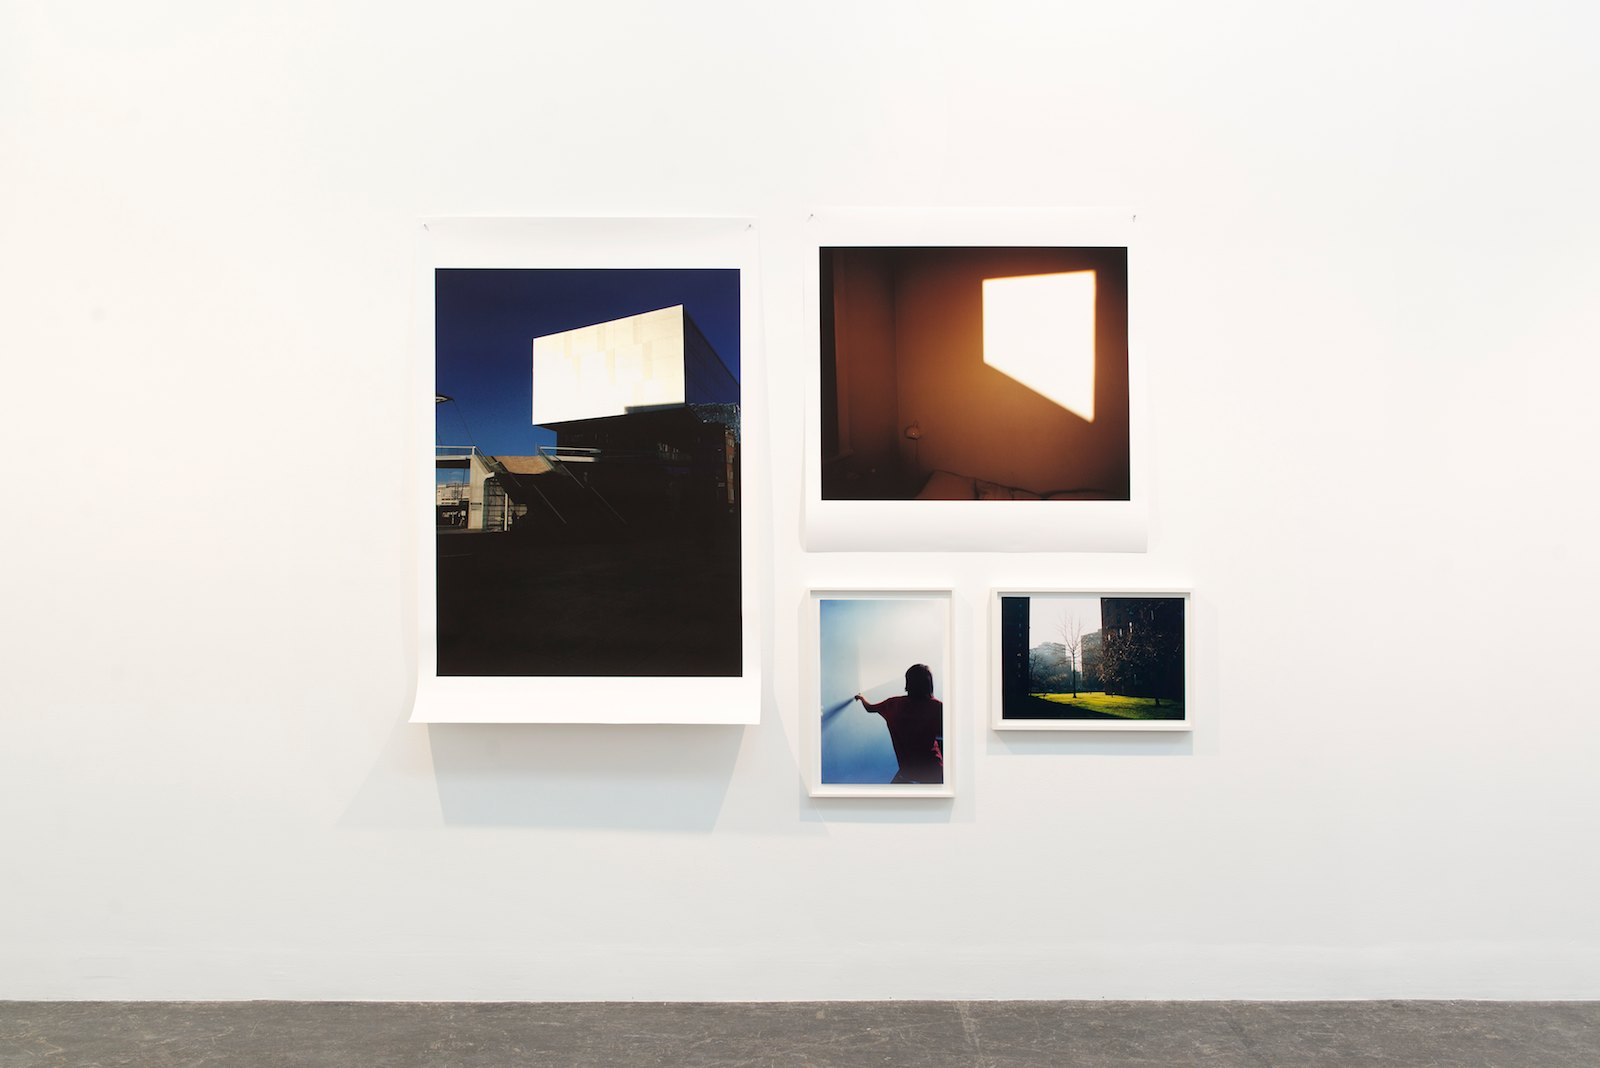 The Invisible Now, 2014 / Trapezoid II , 2010 / Blue Hallway II, 2014 / Green Lawn, 1994.Installation view AURDAL / MUGAAS, Kunstnernes Hus, Oslo, 2016. Photo: Christina Leithe Hansen © Kunstnernes Hus.